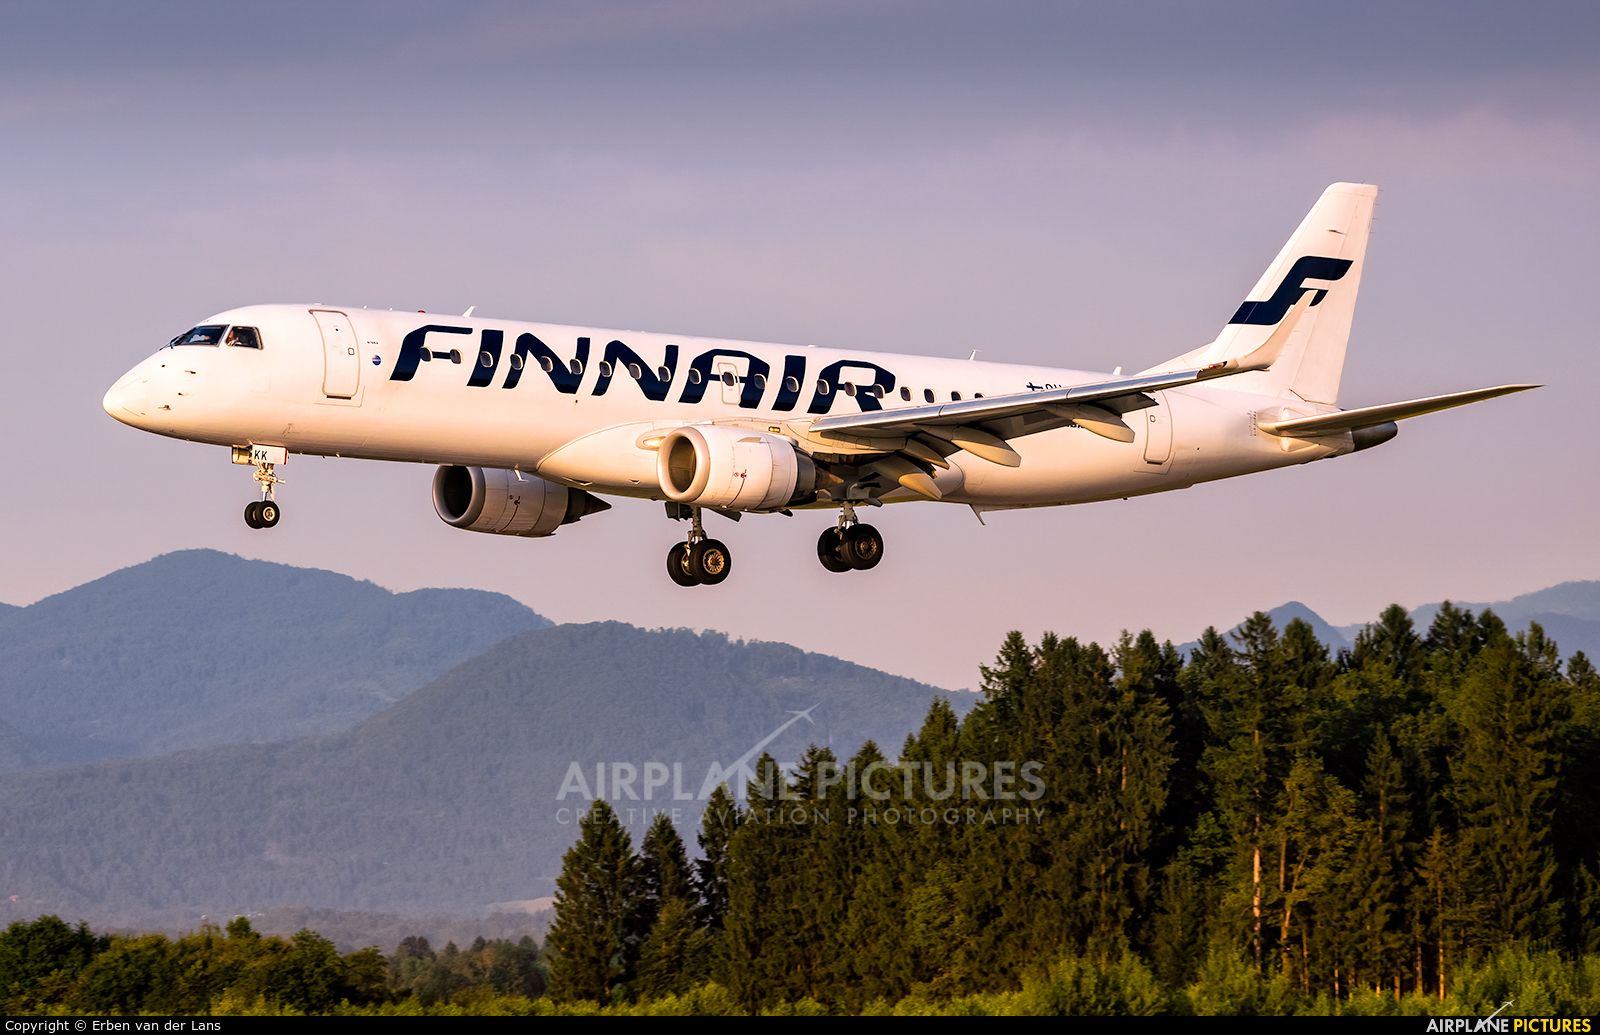 Finnair OH-LKK aircraft at Ljubljana - Brnik